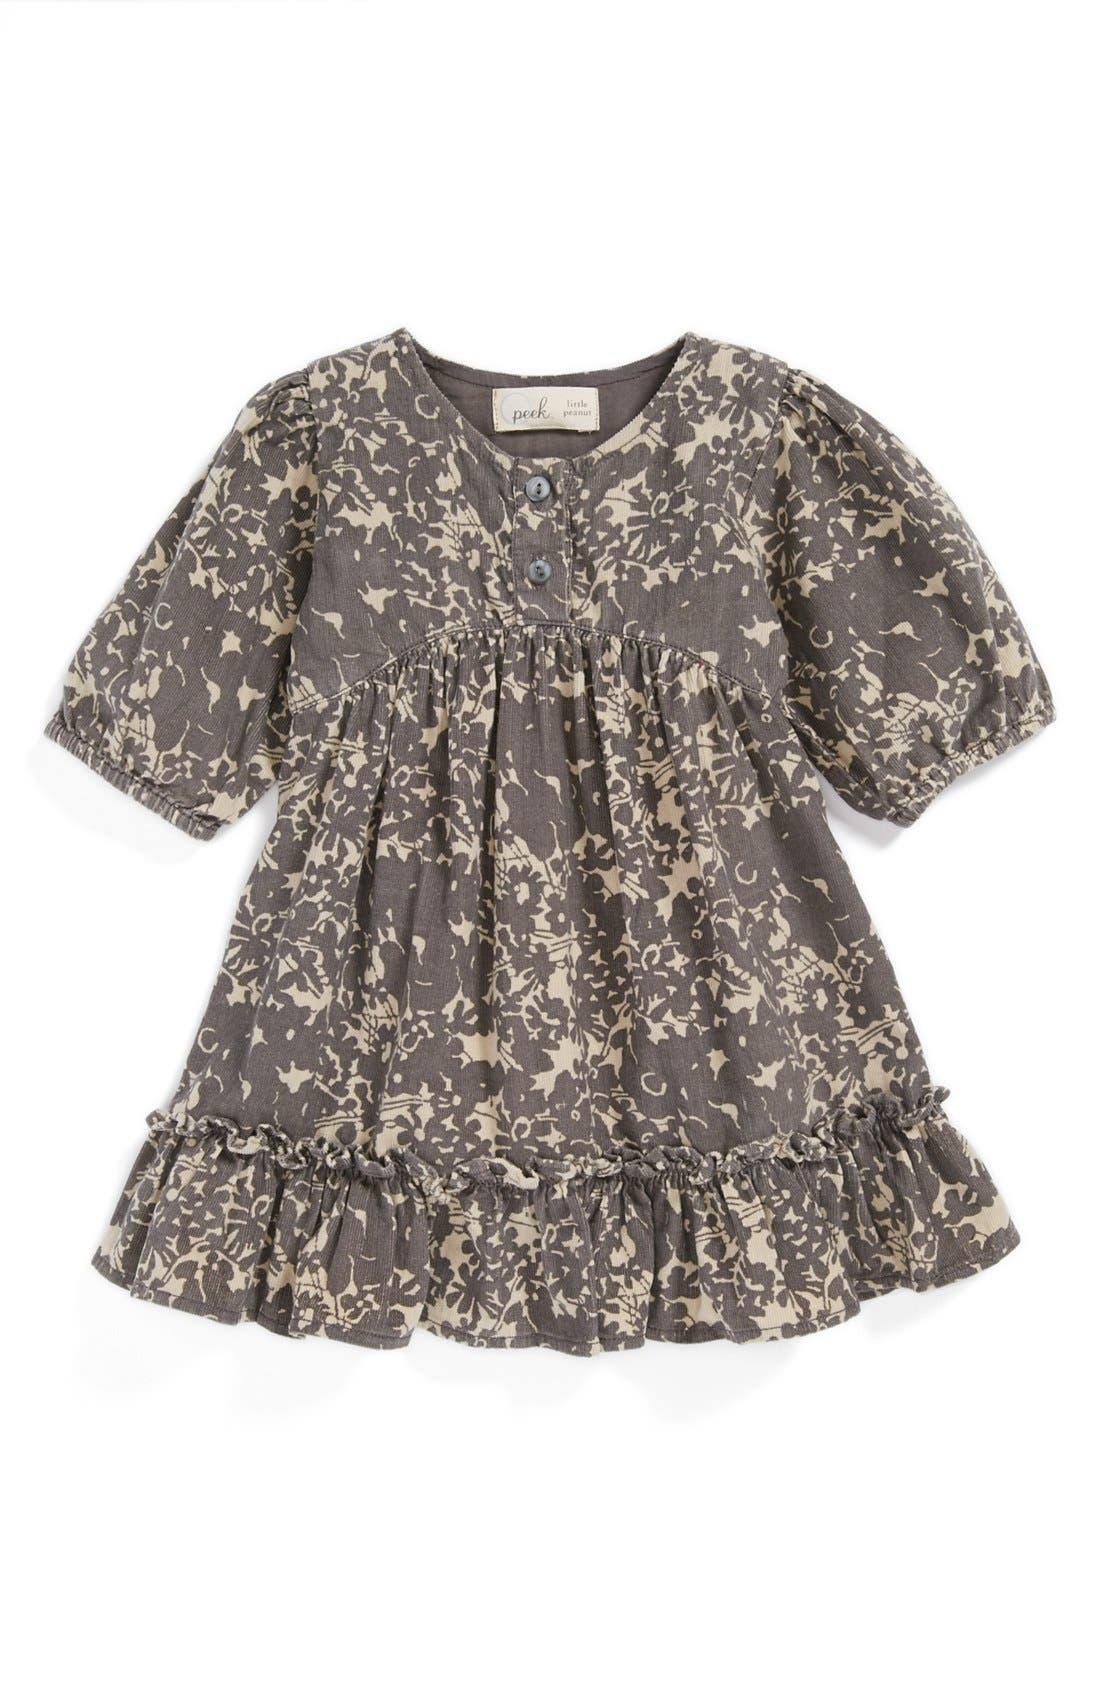 Alternate Image 1 Selected - Peek 'Savannah' Dress (Baby Girls)